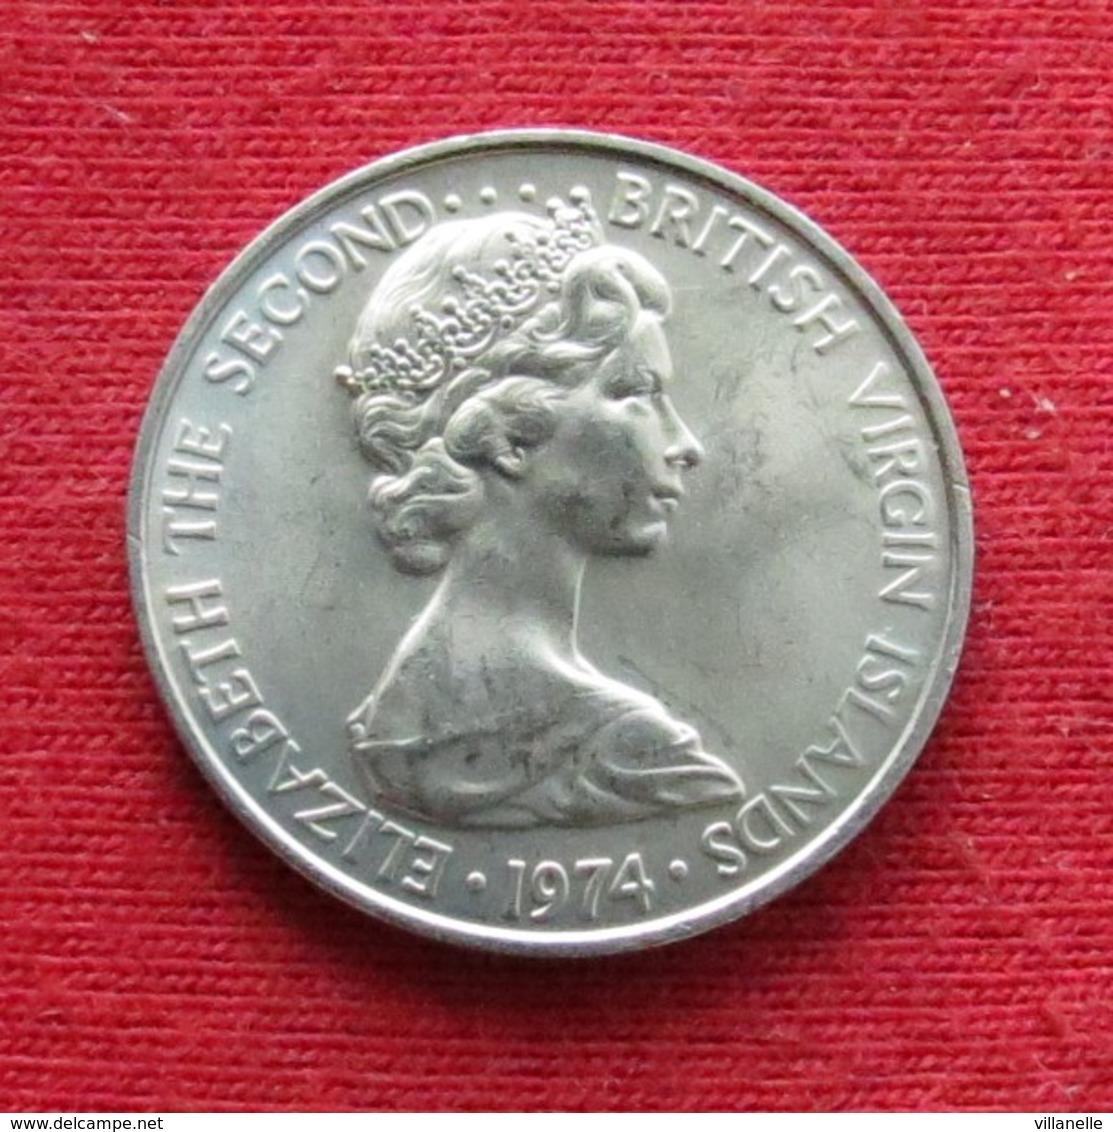 British Virgin Islands 5 Cents 1974 KM# 2 - British Virgin Islands